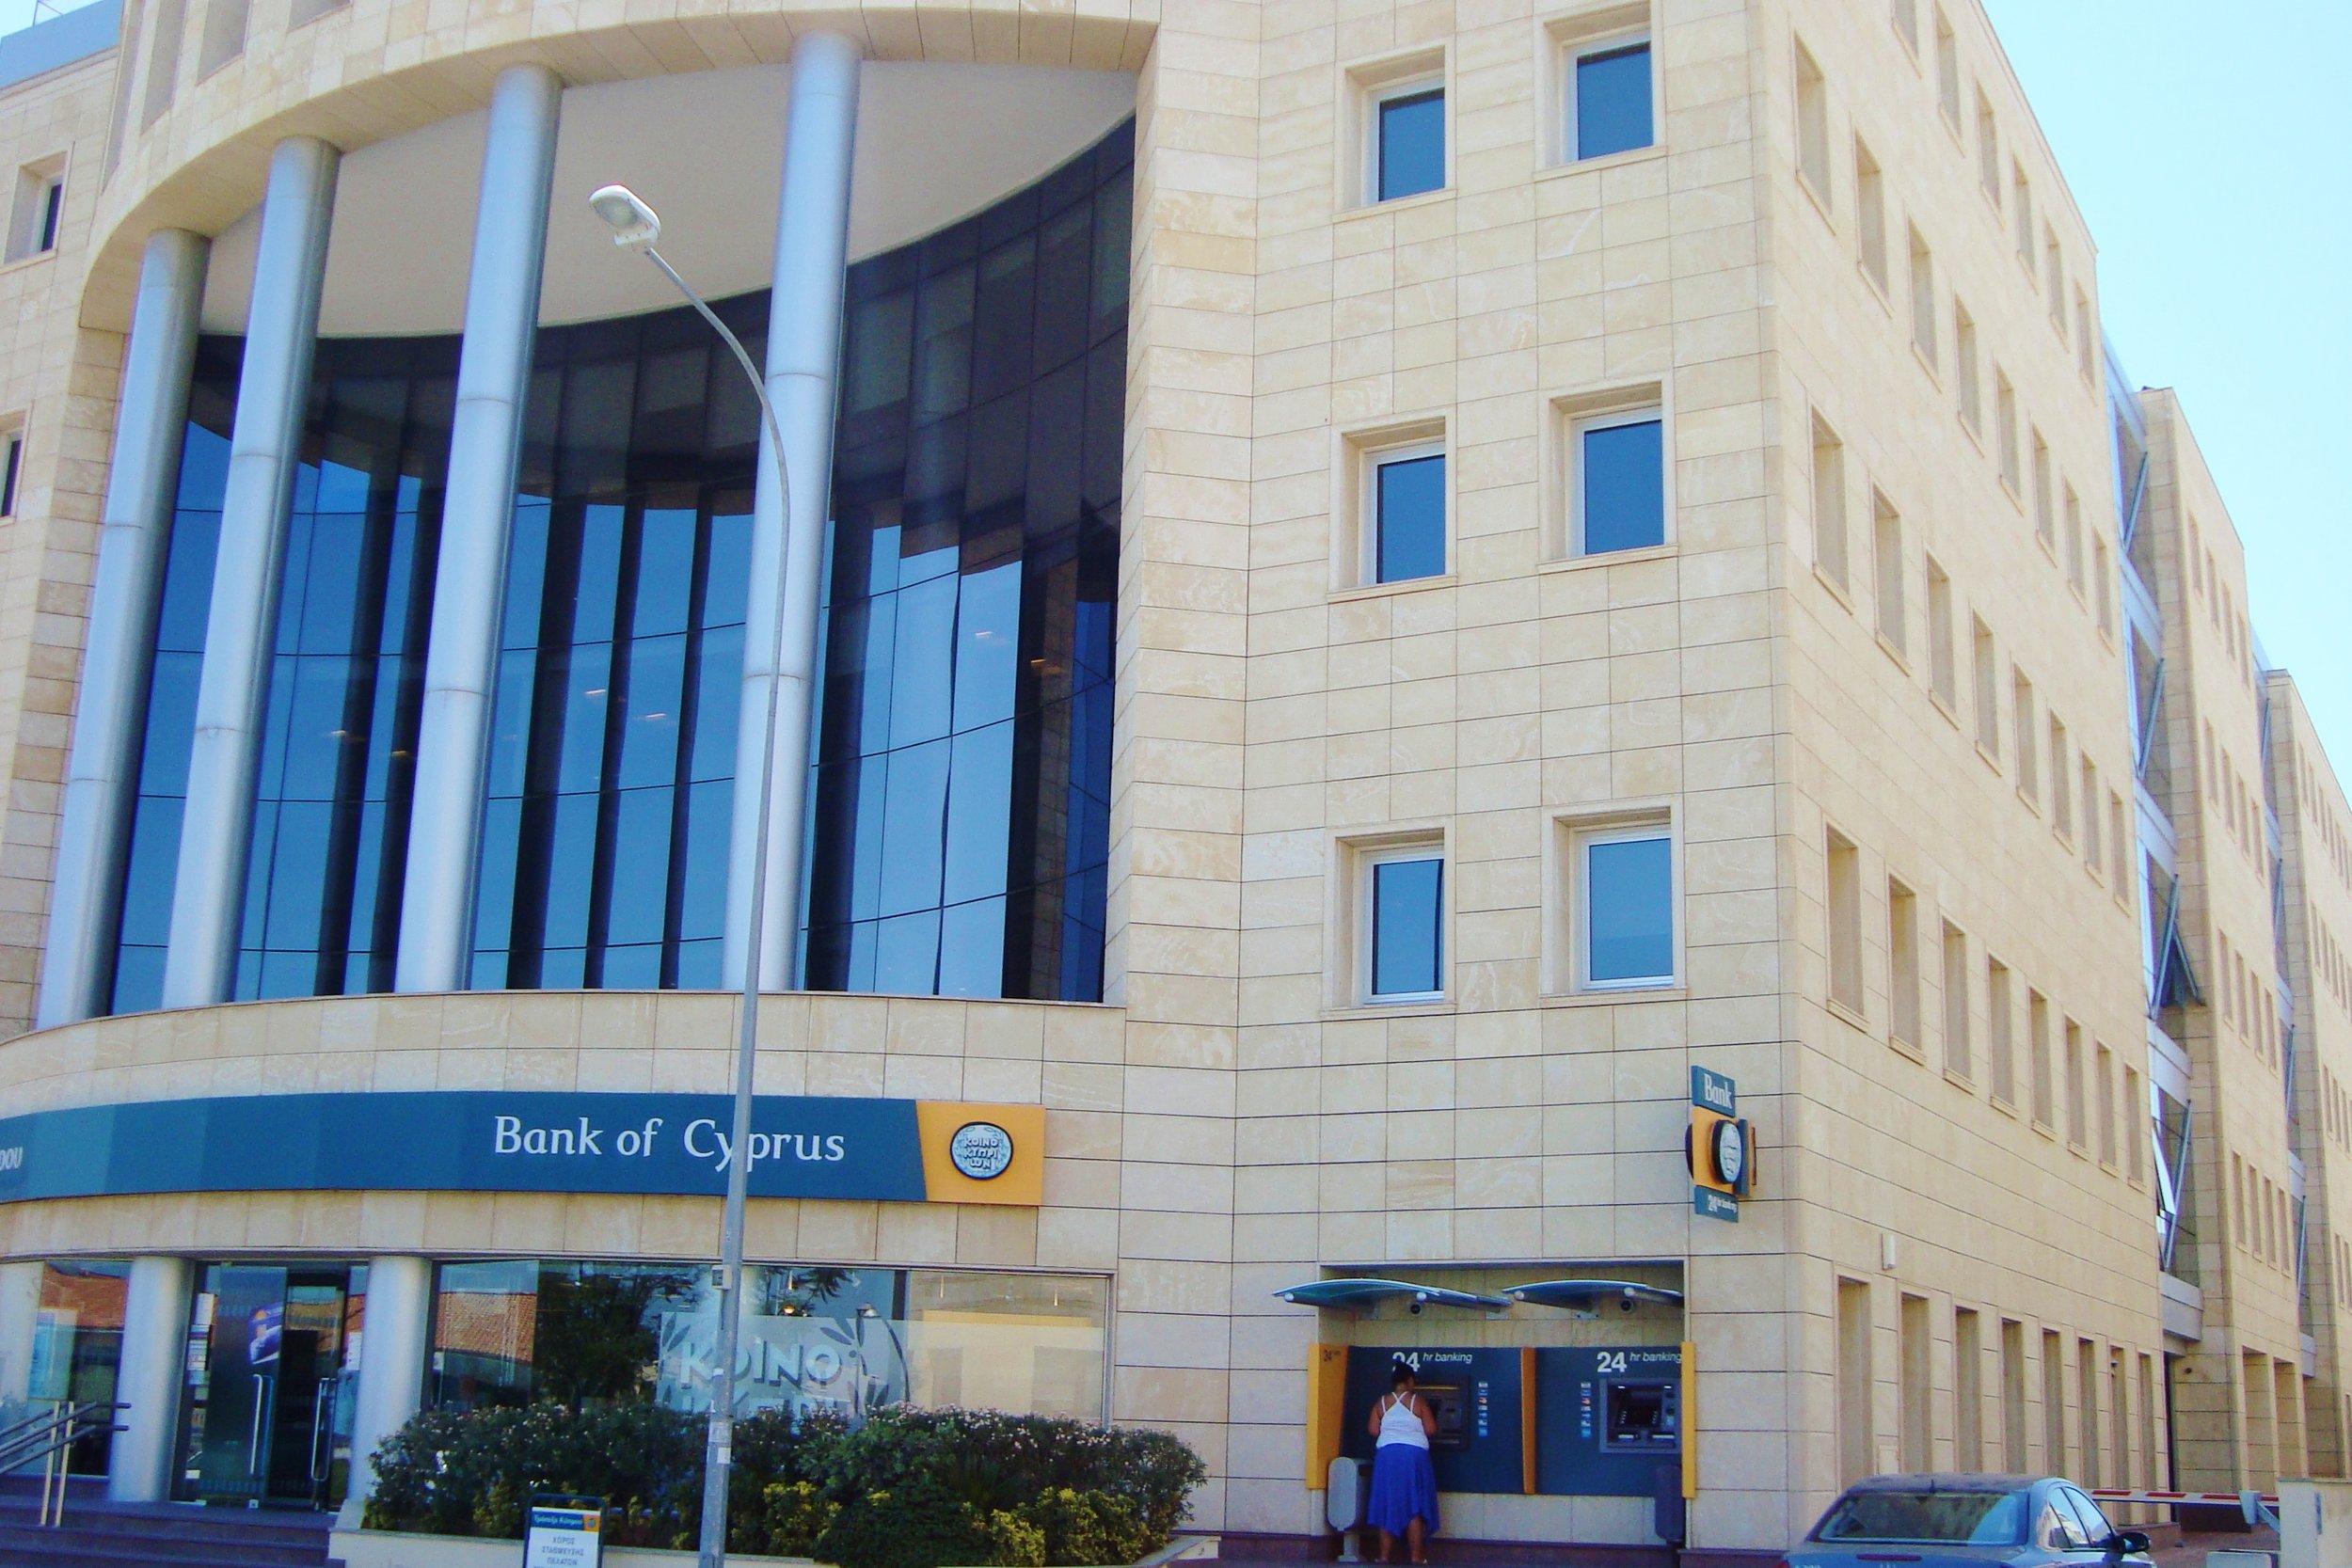 The Bank of Cyprus in Nicosia